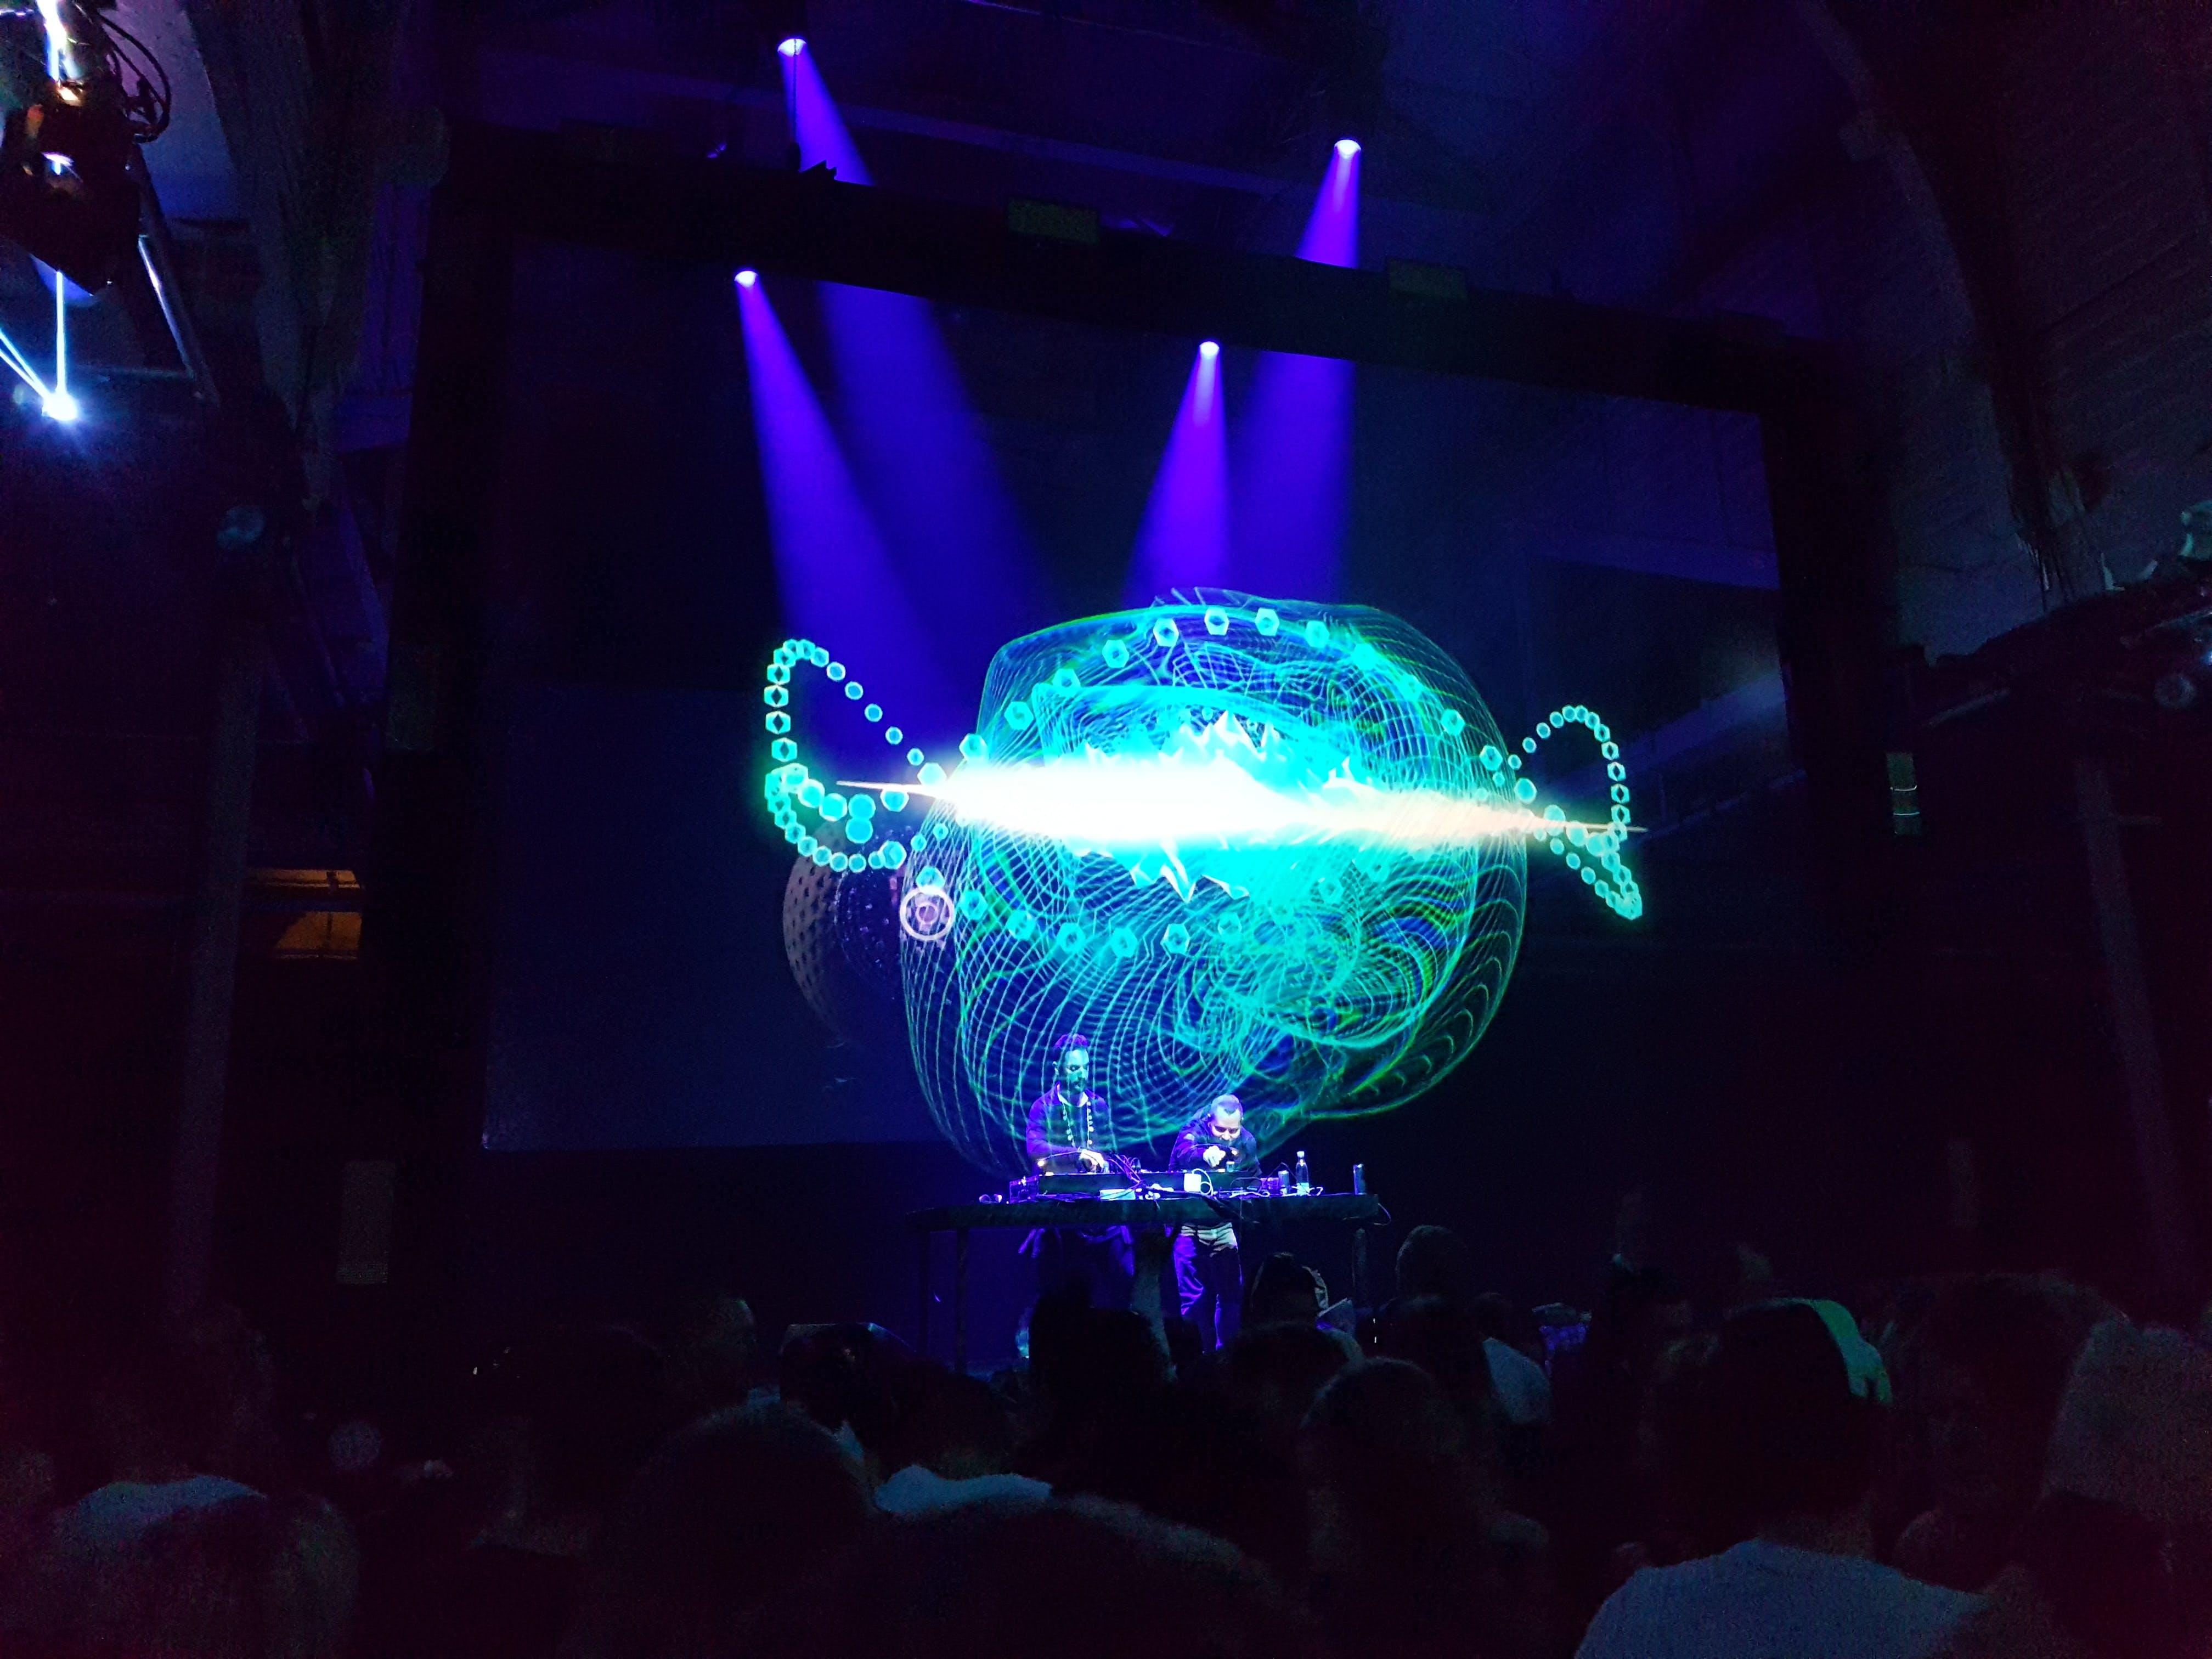 Free stock photo of 2016?, copenhagen, Hologram show, Psytrance